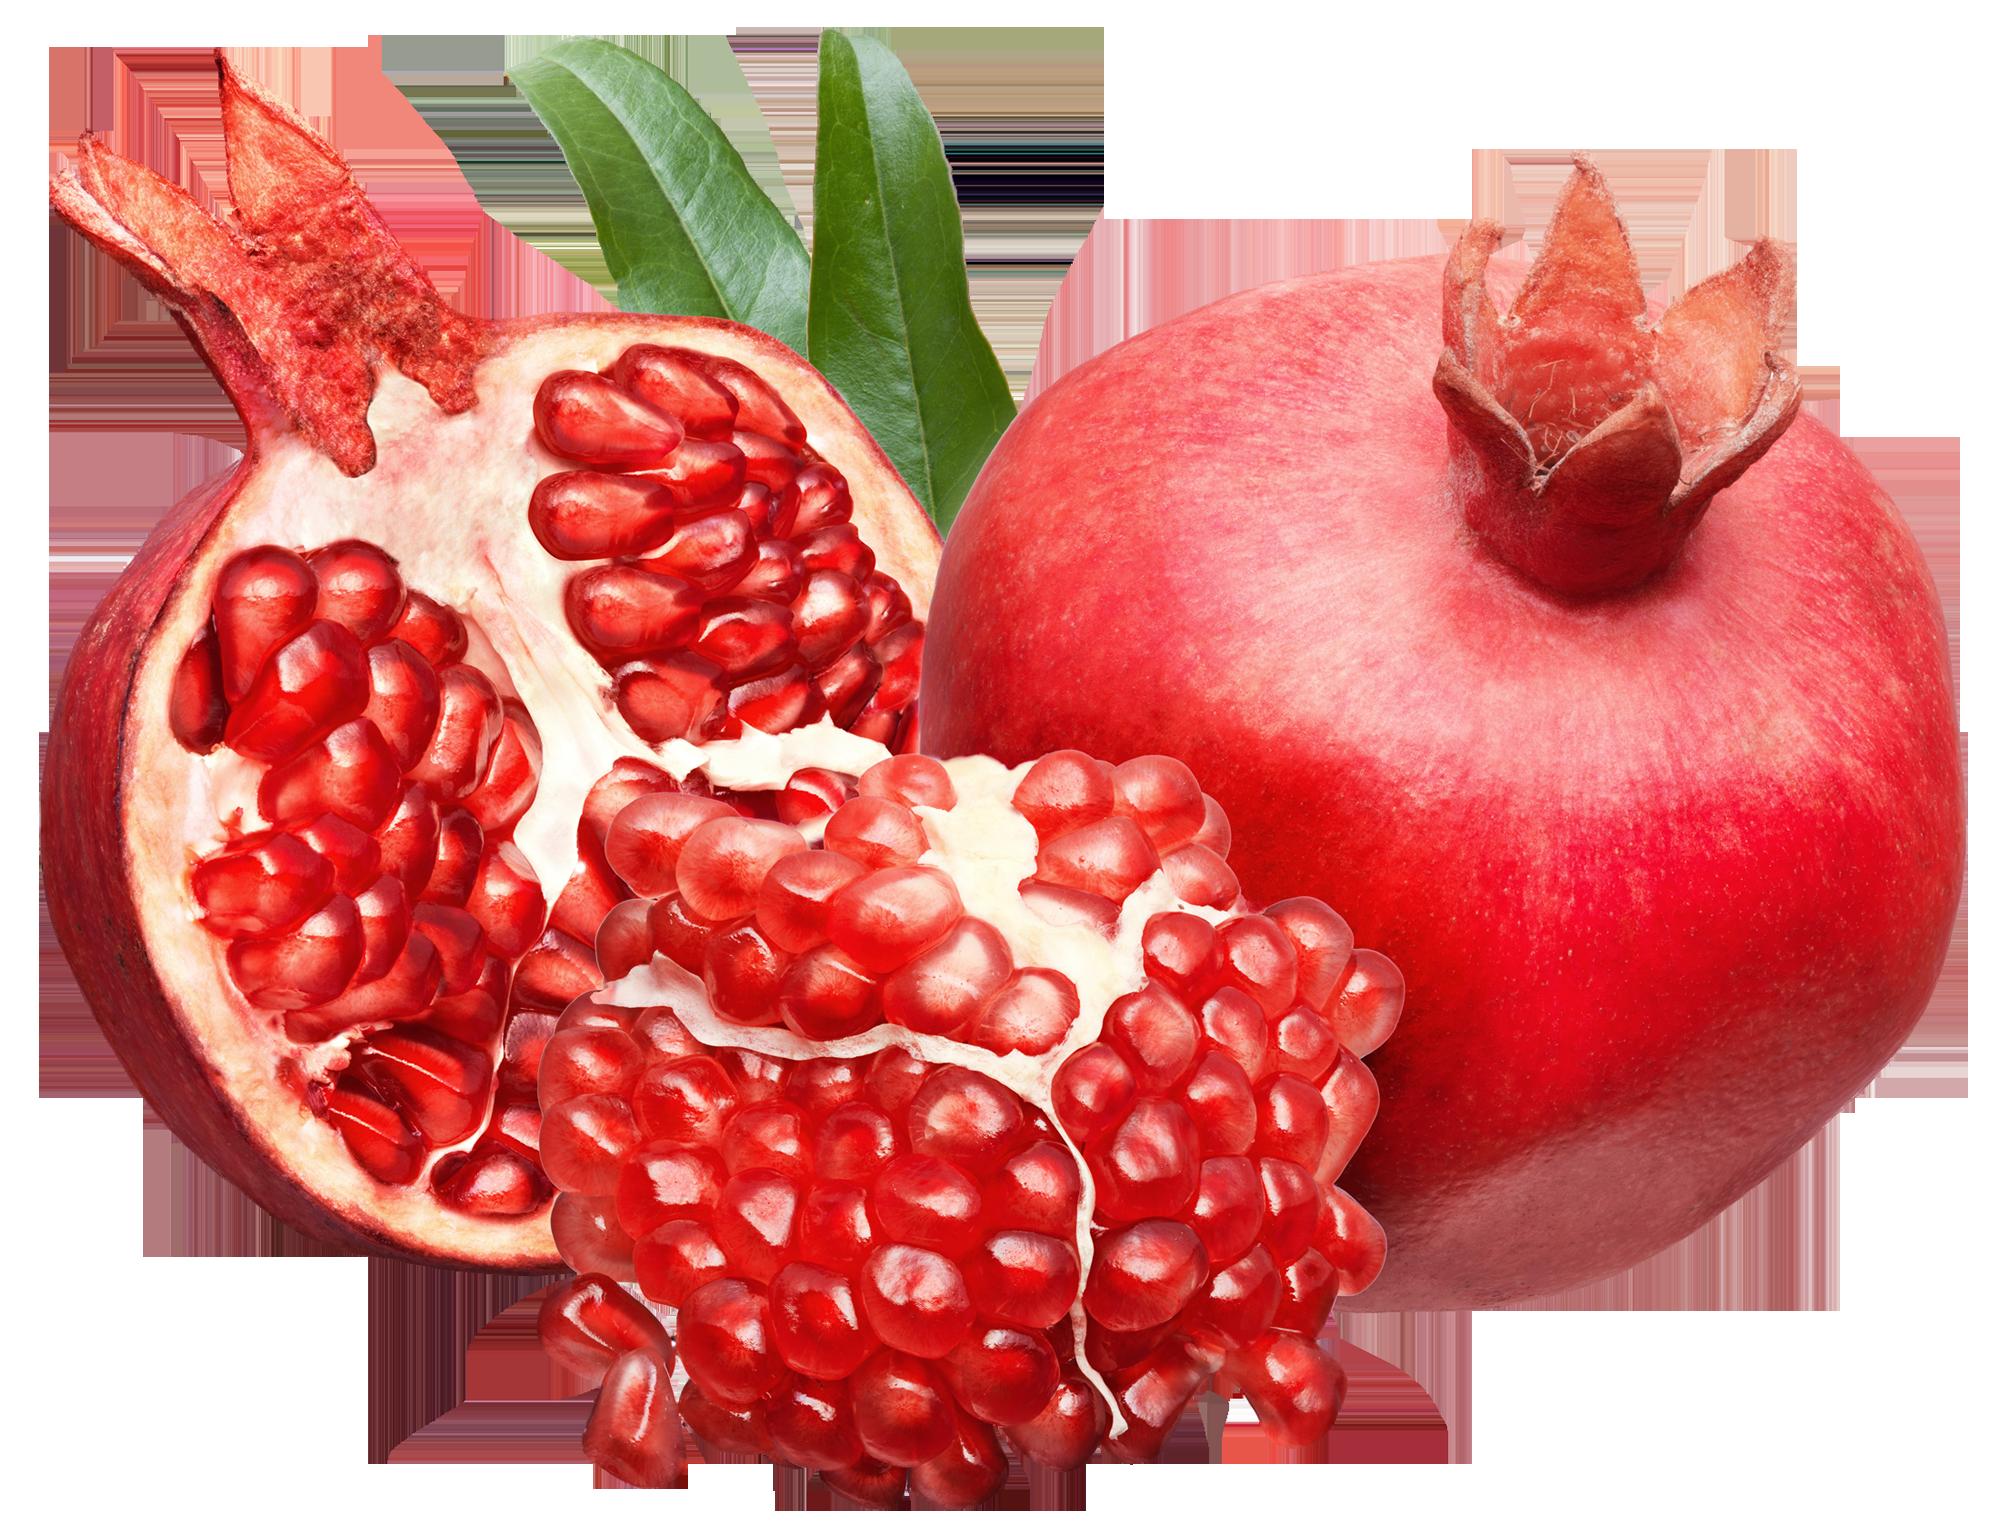 Image Pomegranate Png Image Pomegranate Png Image